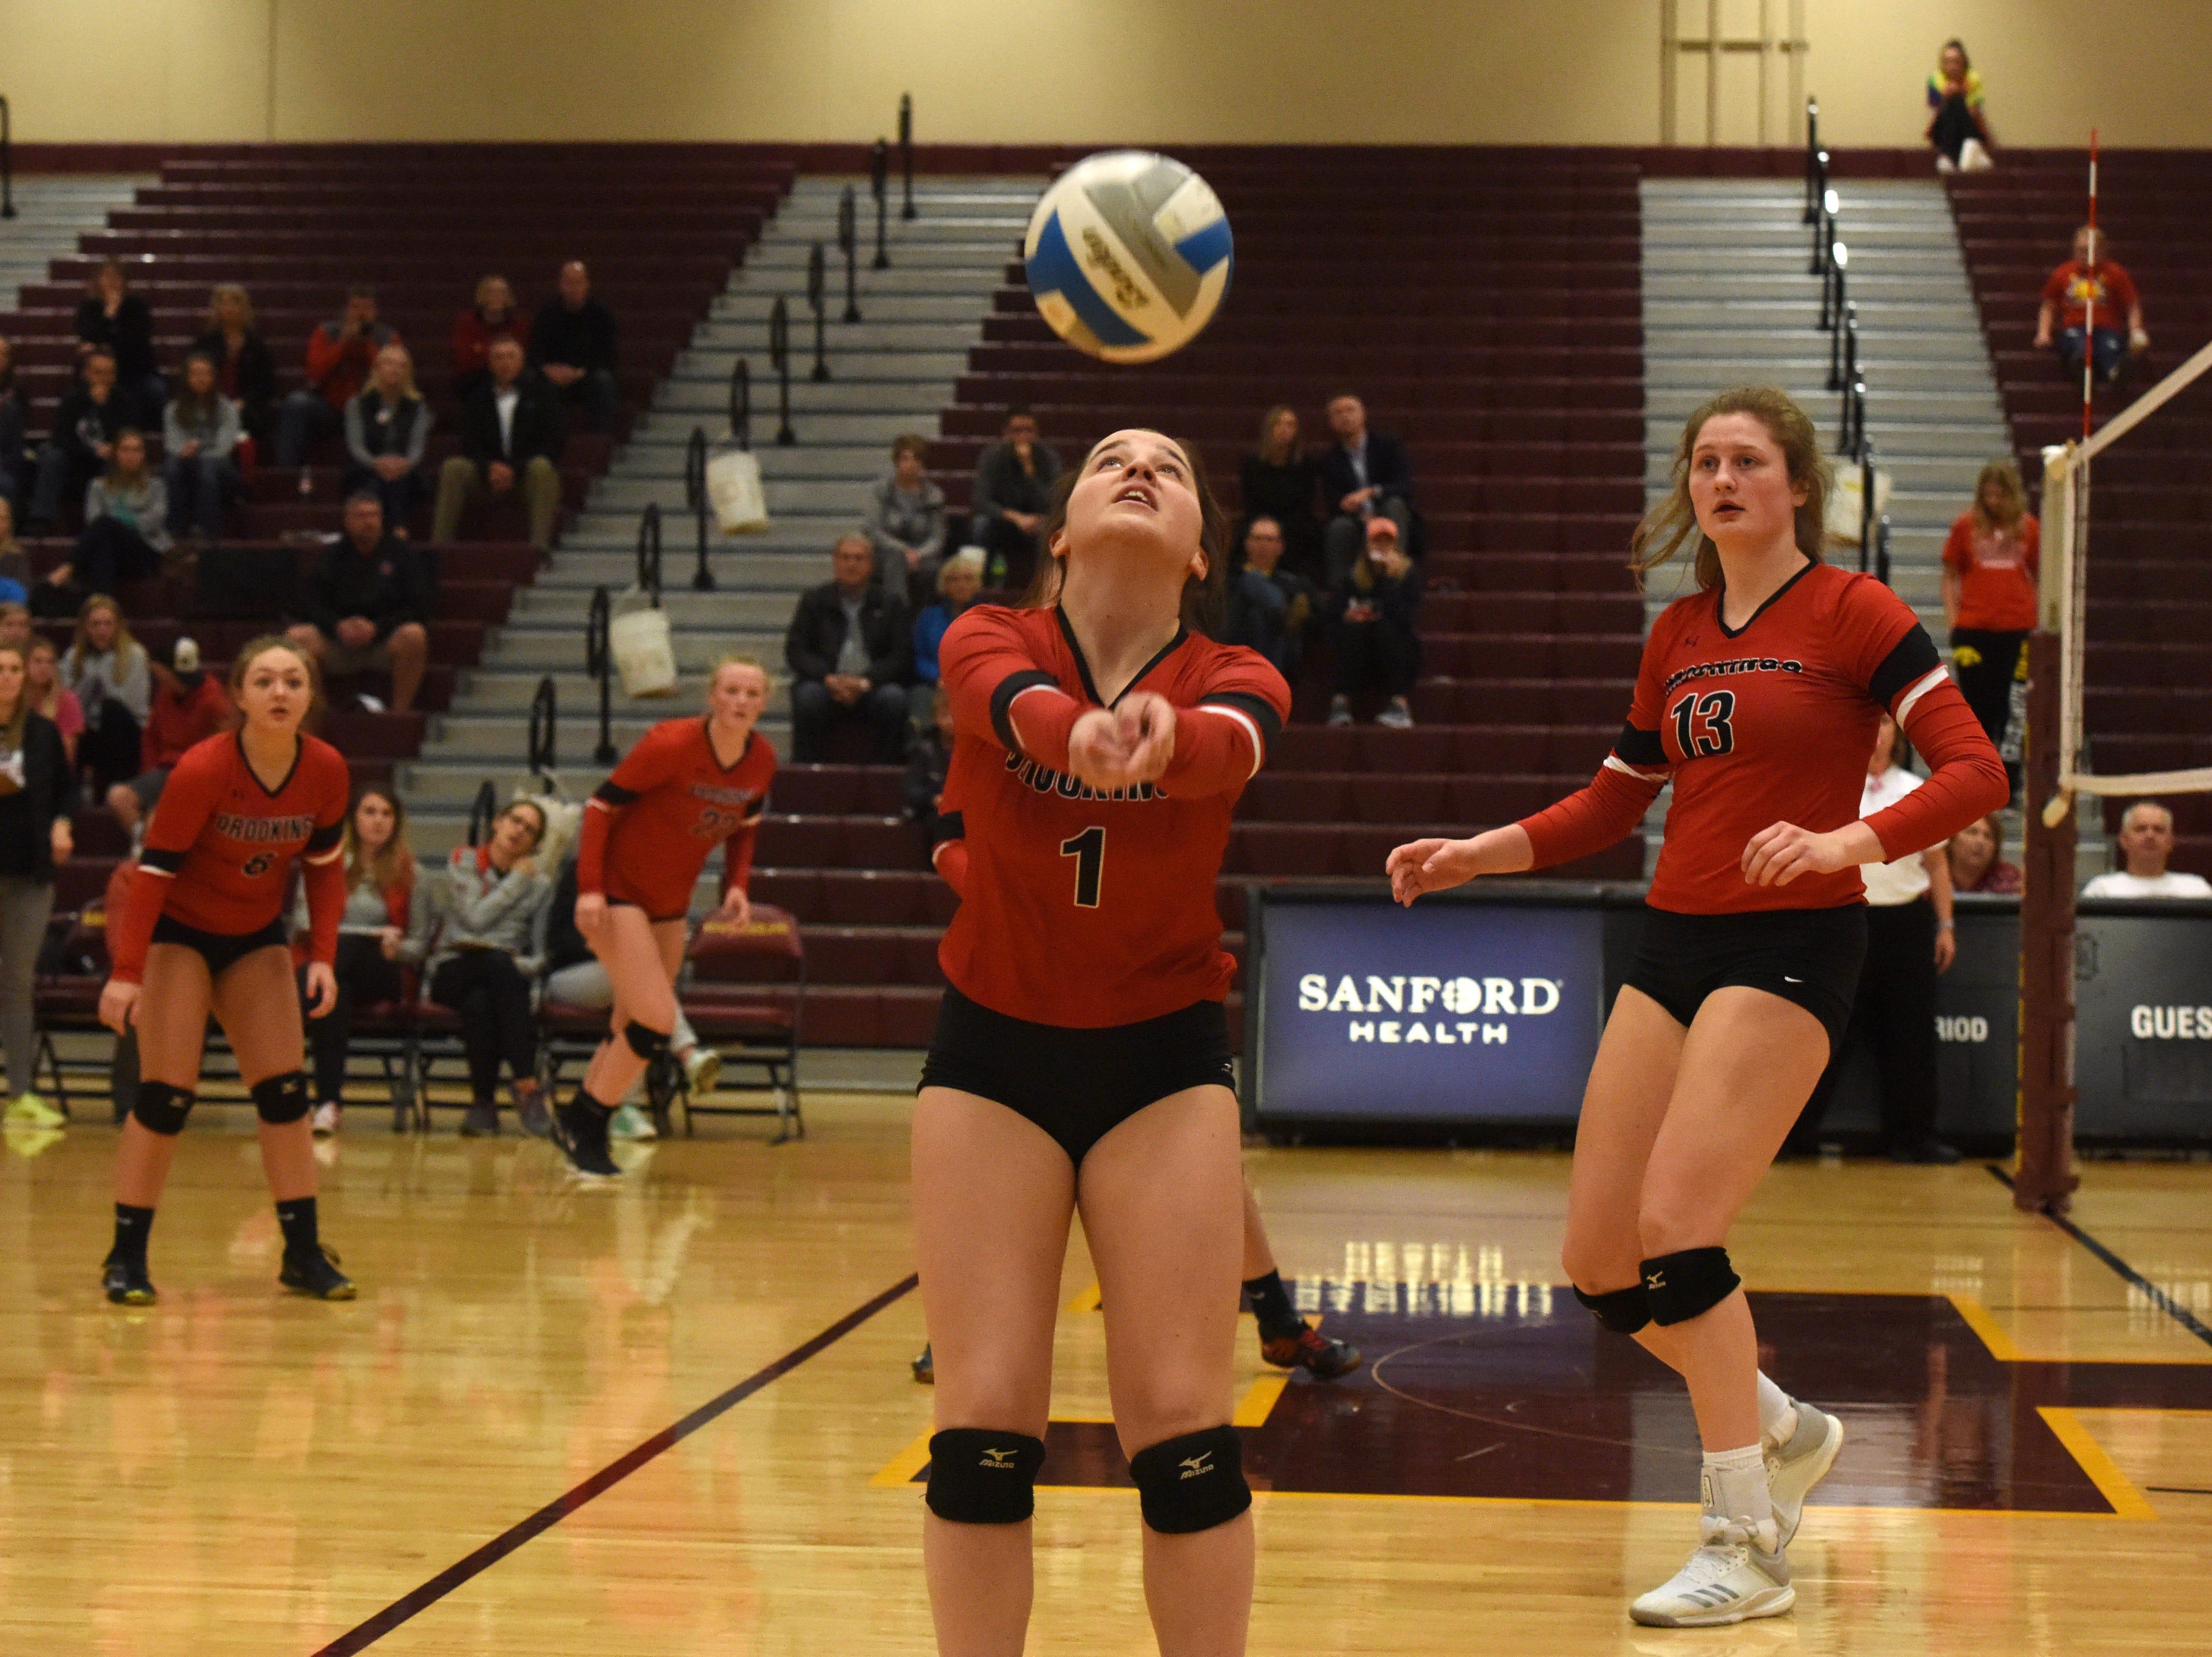 Brookings' Molly Steffensen (1) bumps the ball during a match against Harrisburg, Tuesday, Oct. 30, 2018 in Harrisburg, S.D.